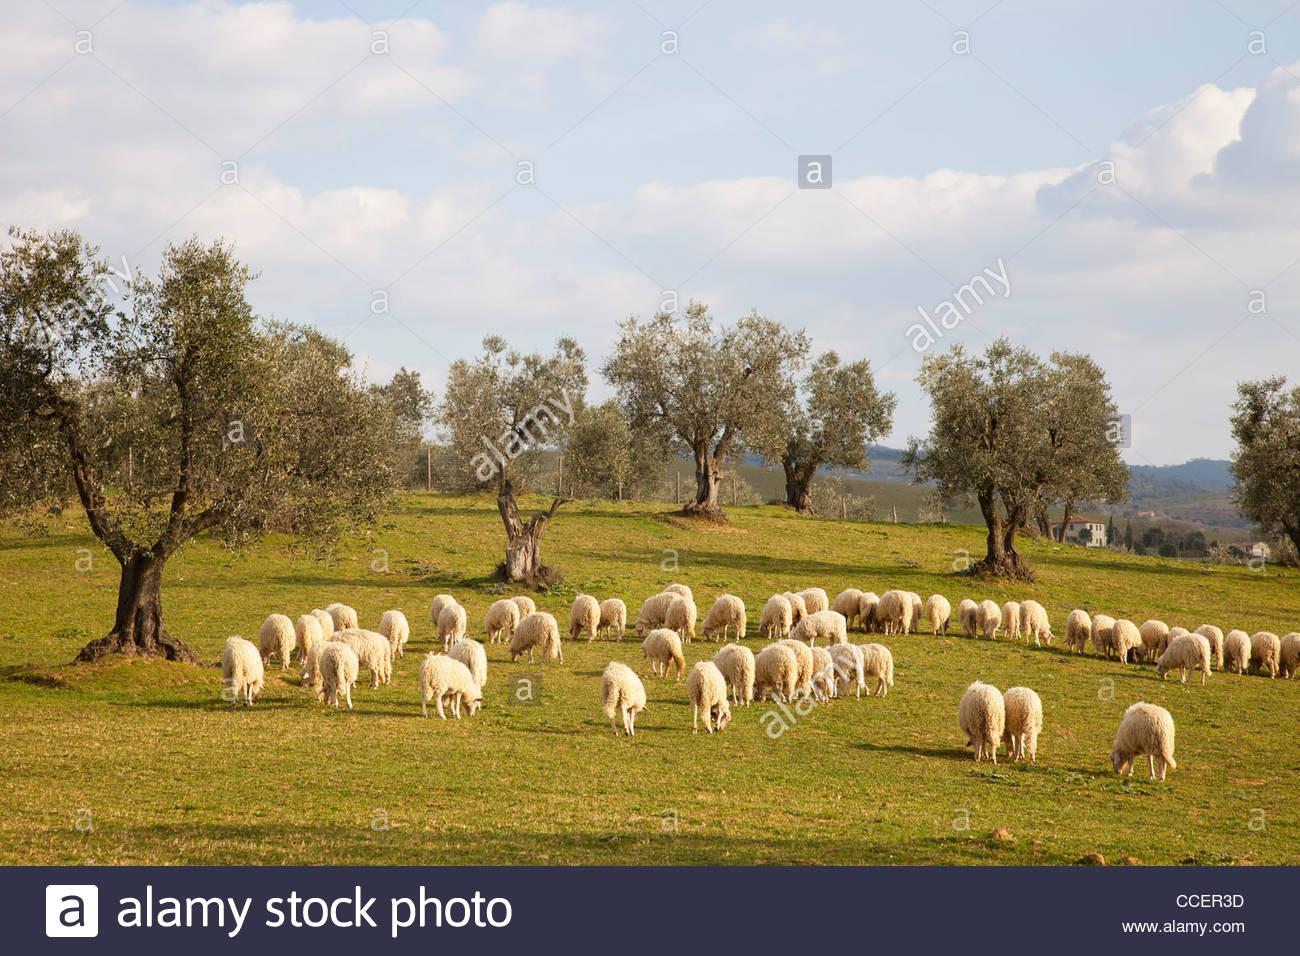 sheep,countryside,scansano,province of grosseto,tuscany,italy,europe - Stock Image